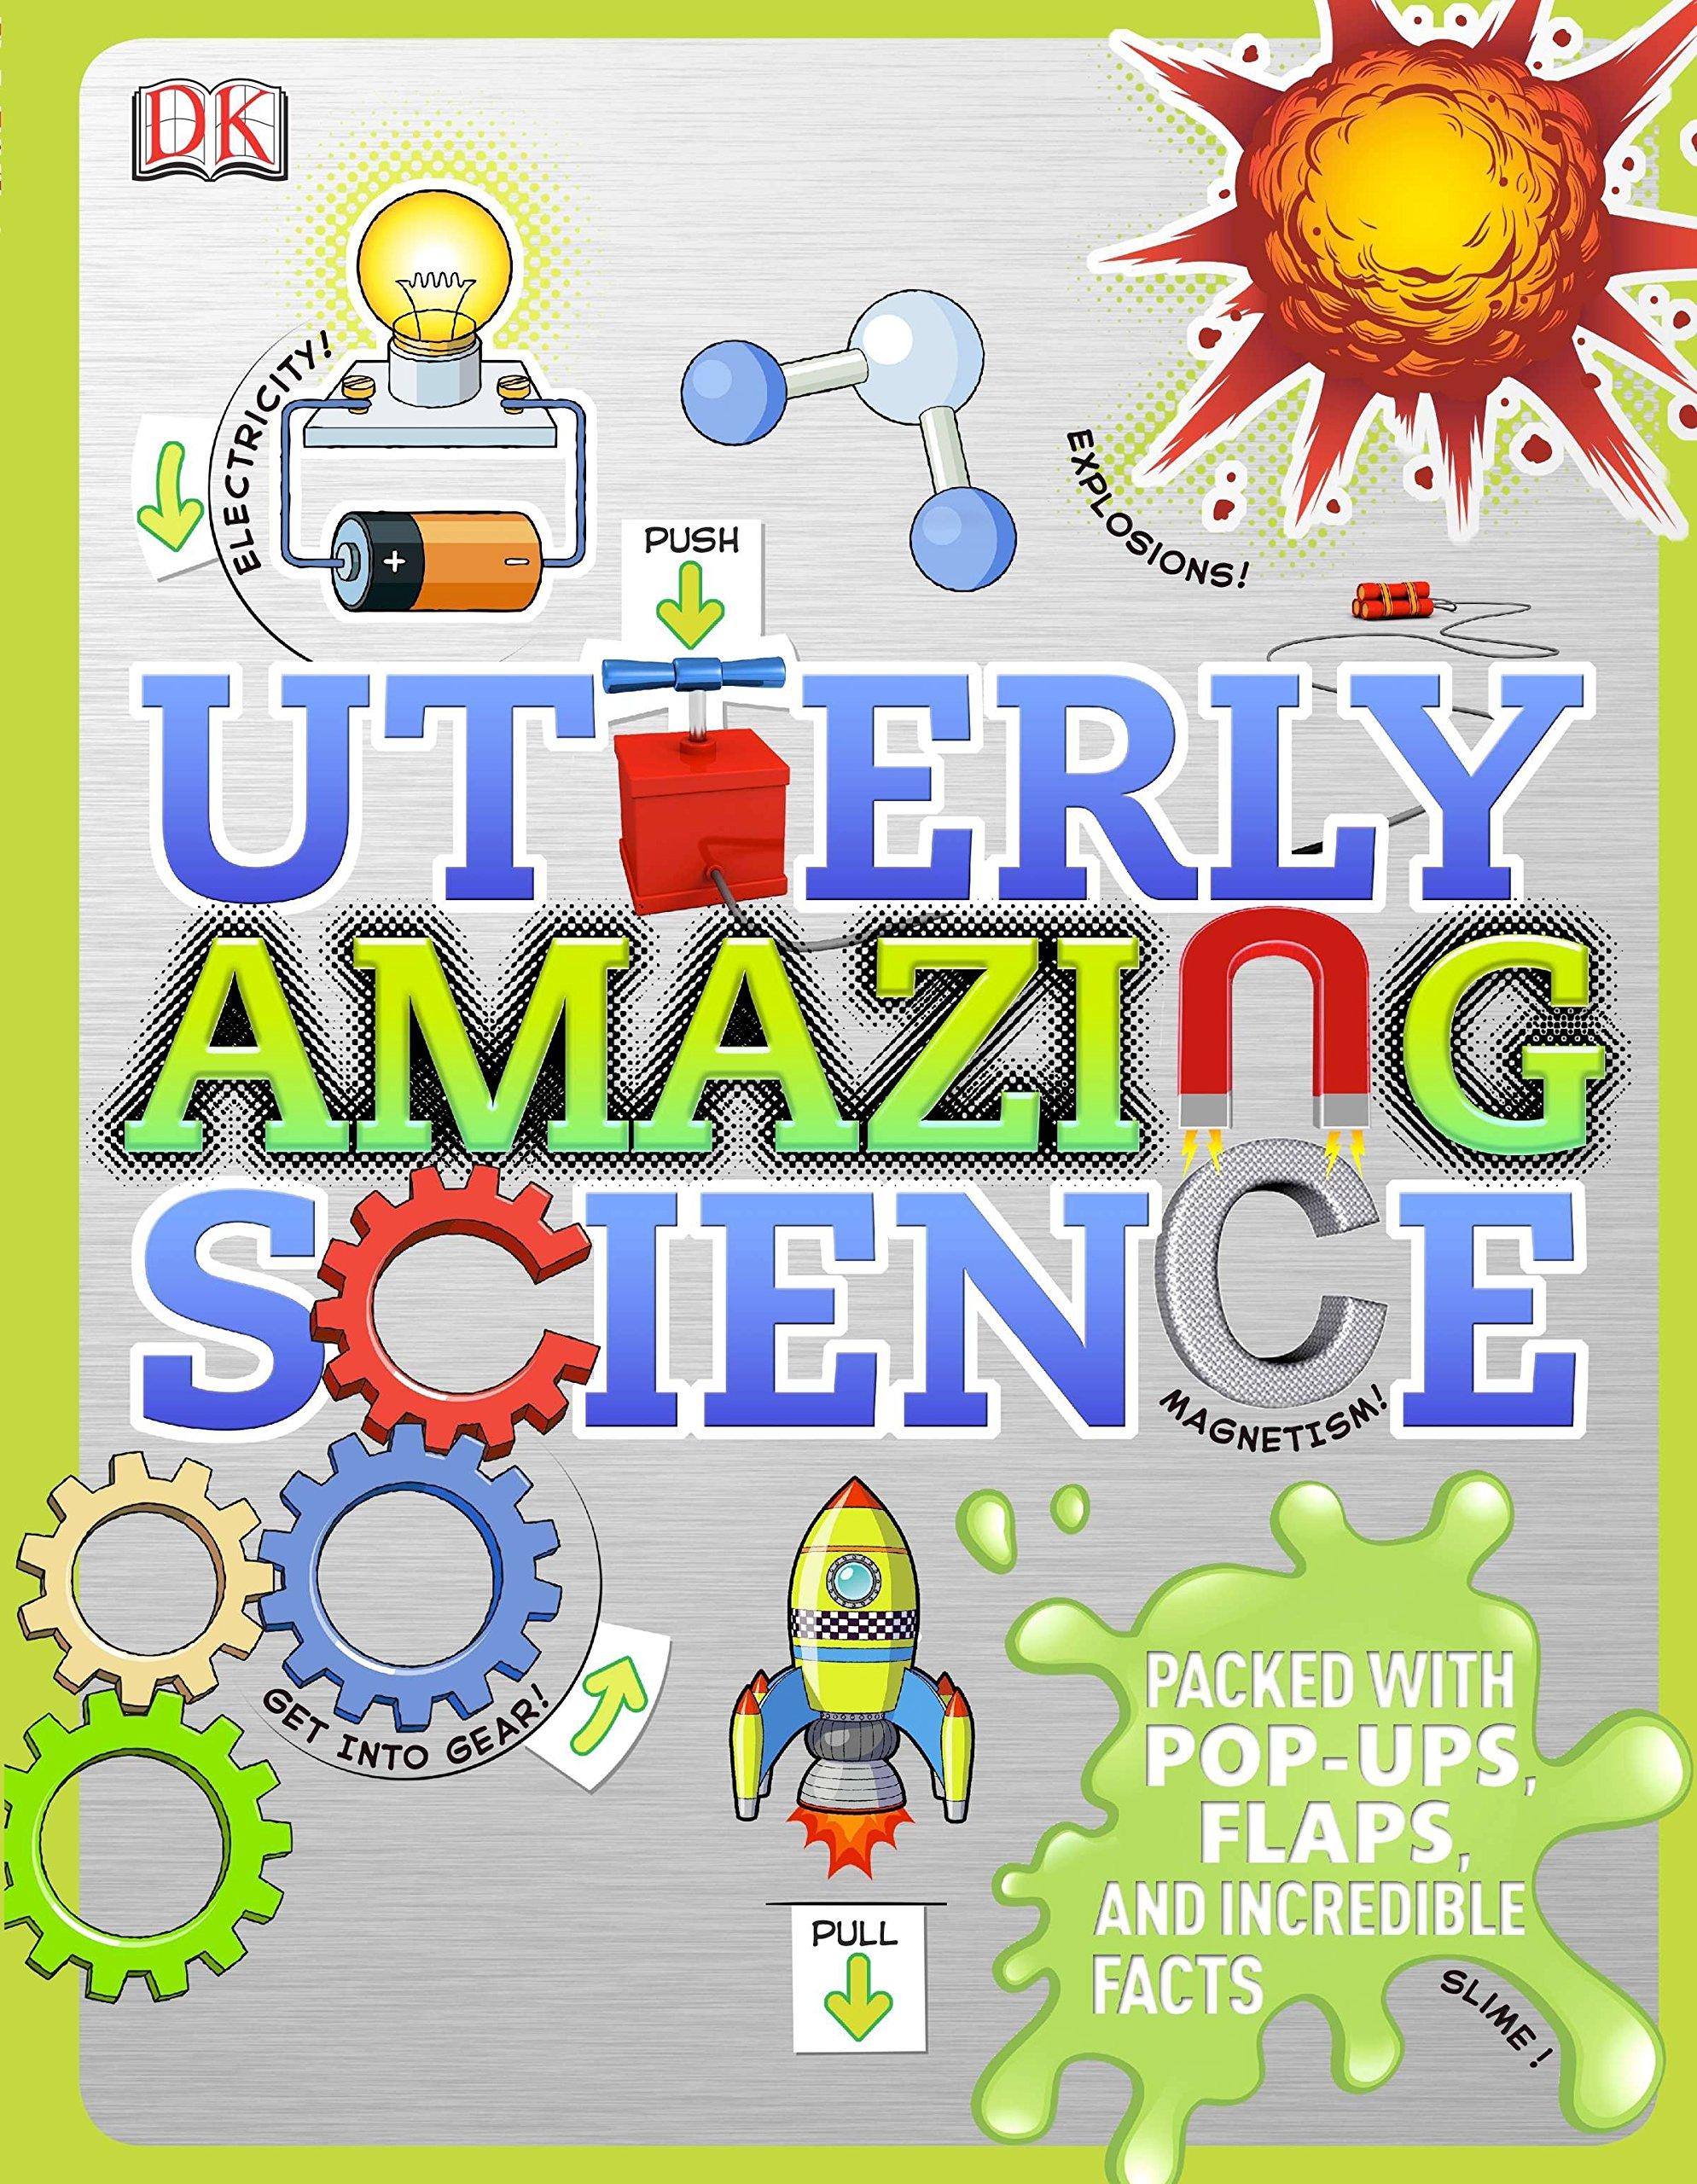 Utterly Amazing Science Robert Winston 9781465414212 Amazon Books